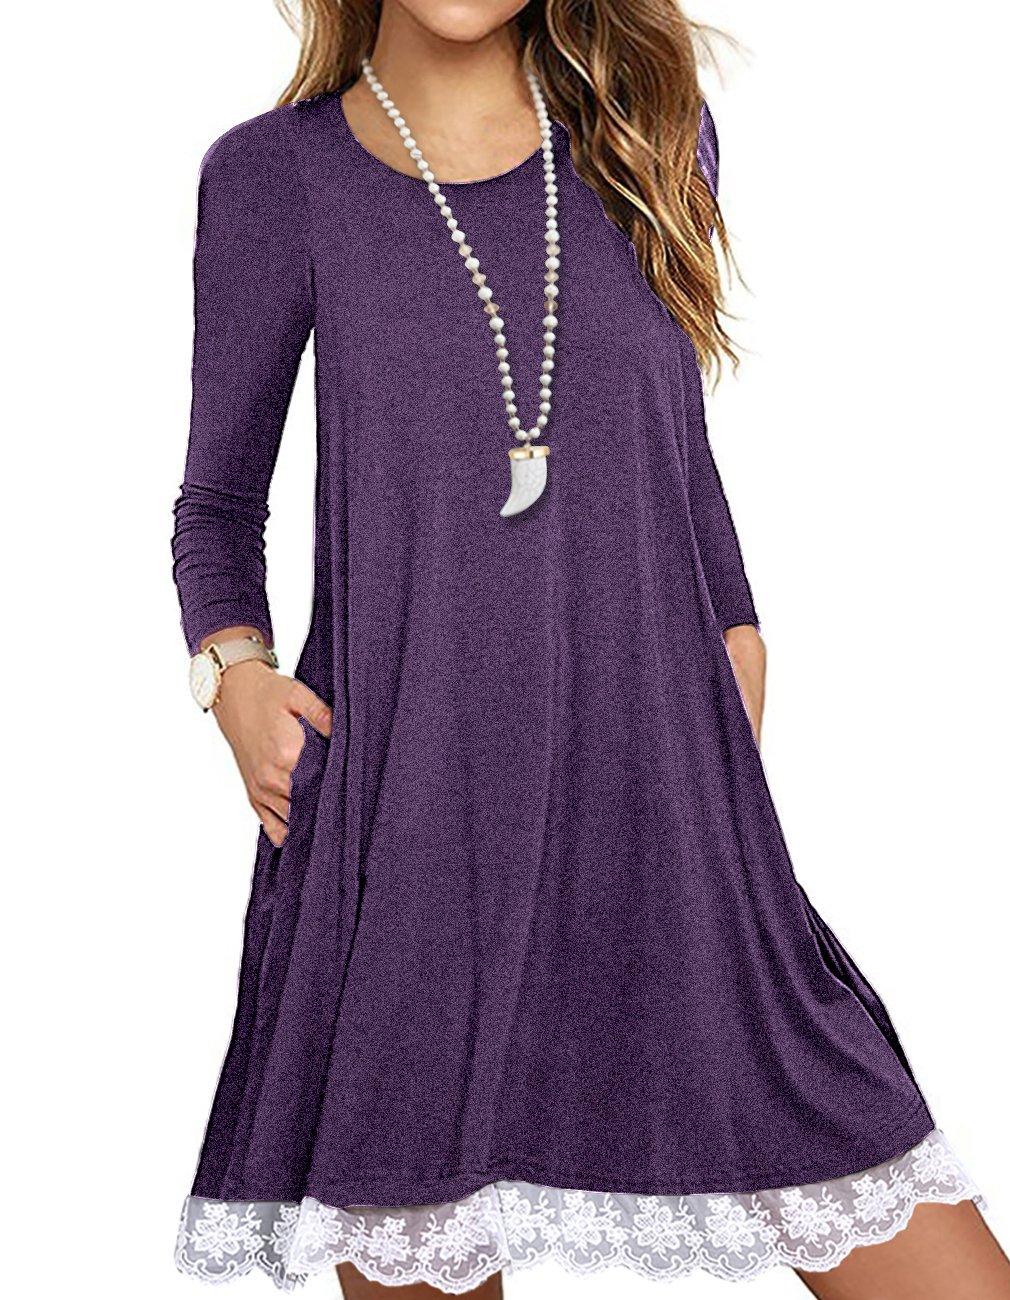 Sanifer Women's Long Sleeve Cotton Lace T Shirt Dress with Pockets (XX-Large, Purple)